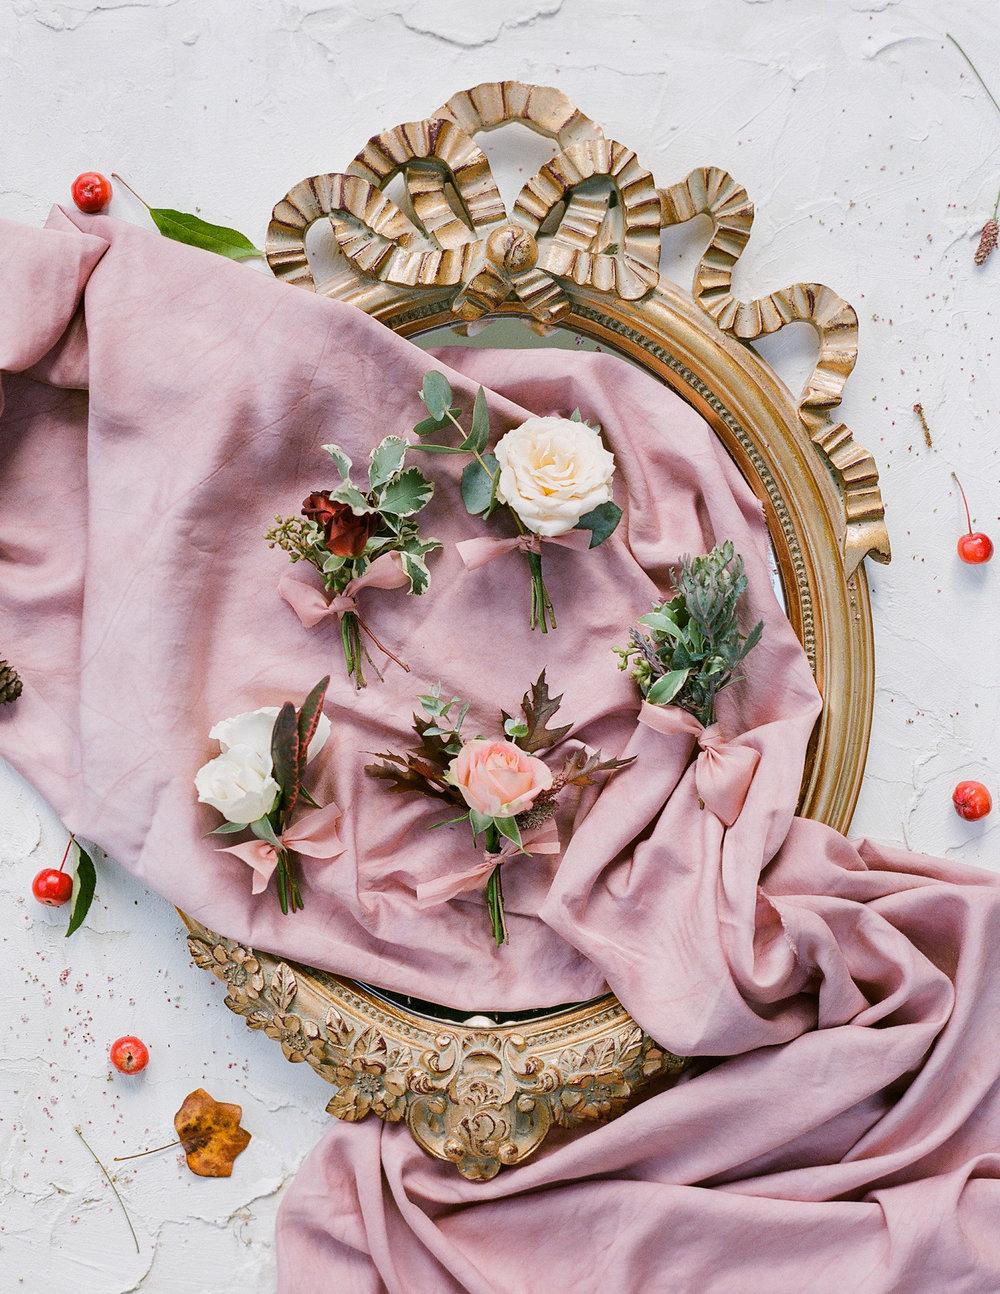 Luxury Wedding Planner UK, London & Europe | A Feminine & Refined Autumn Wedding Inspiration | English Manor Country Autumn Wedding Moody Romantic Warm Velvet Black Red and Peach Tones | Molly Carr Photography65.JPG